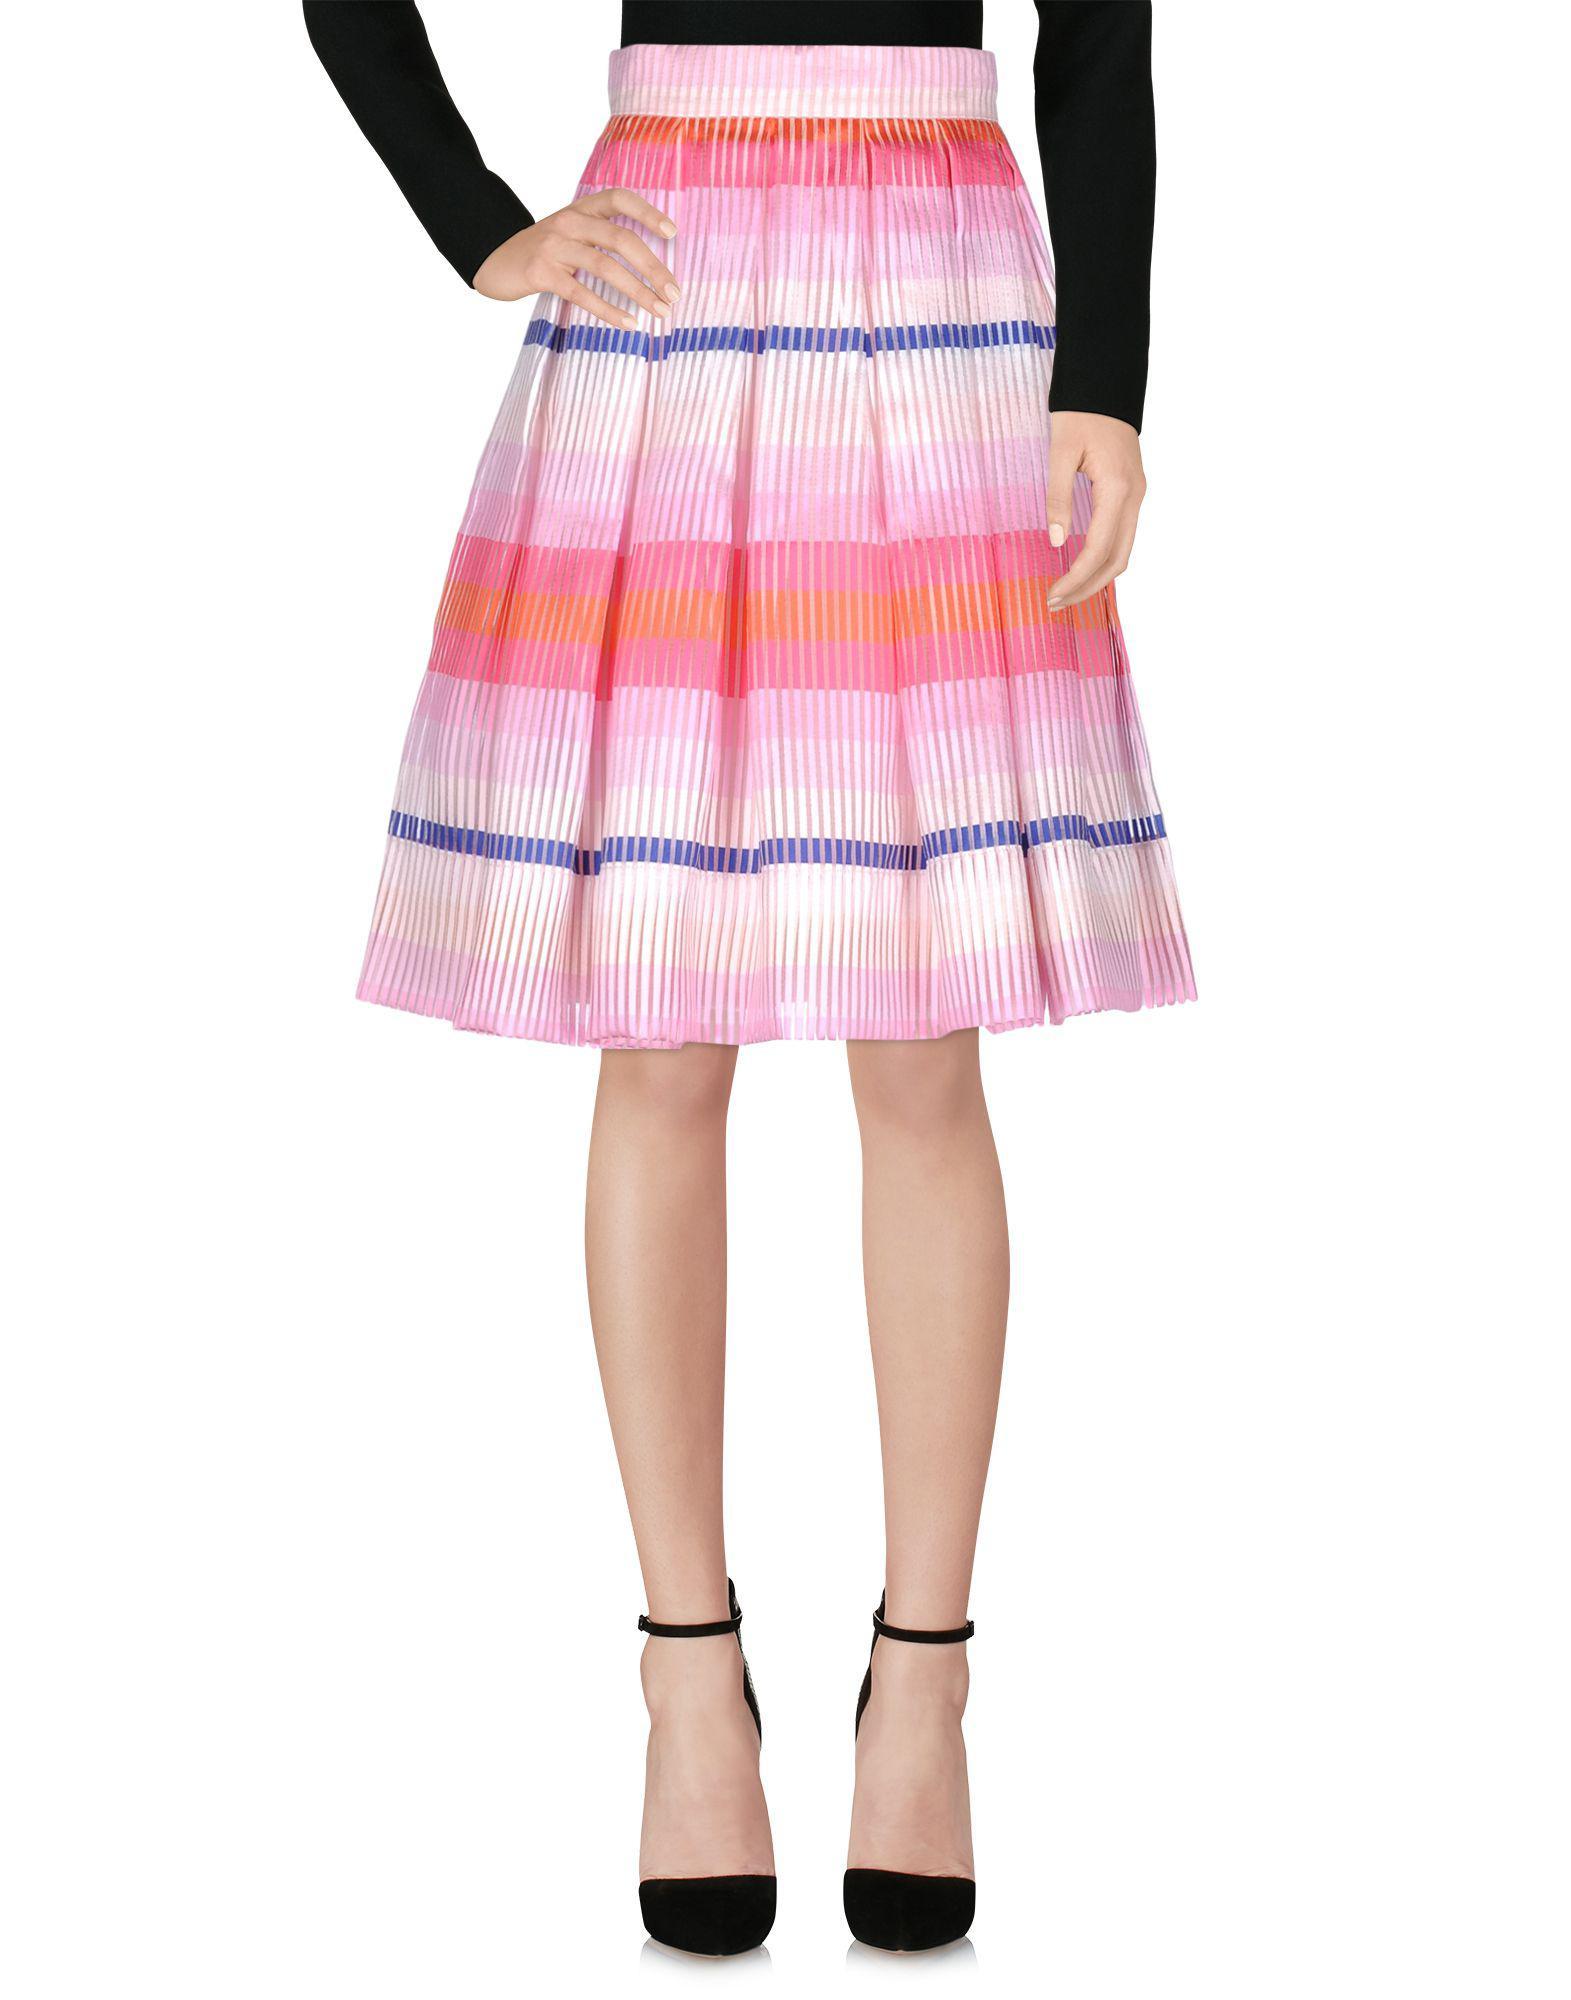 Visit Cheap Price SKIRTS - 3/4 length skirts Daizy Shely Cheapest Price Cheap Online Buy Cheap New Styles bj5s4kkC1m